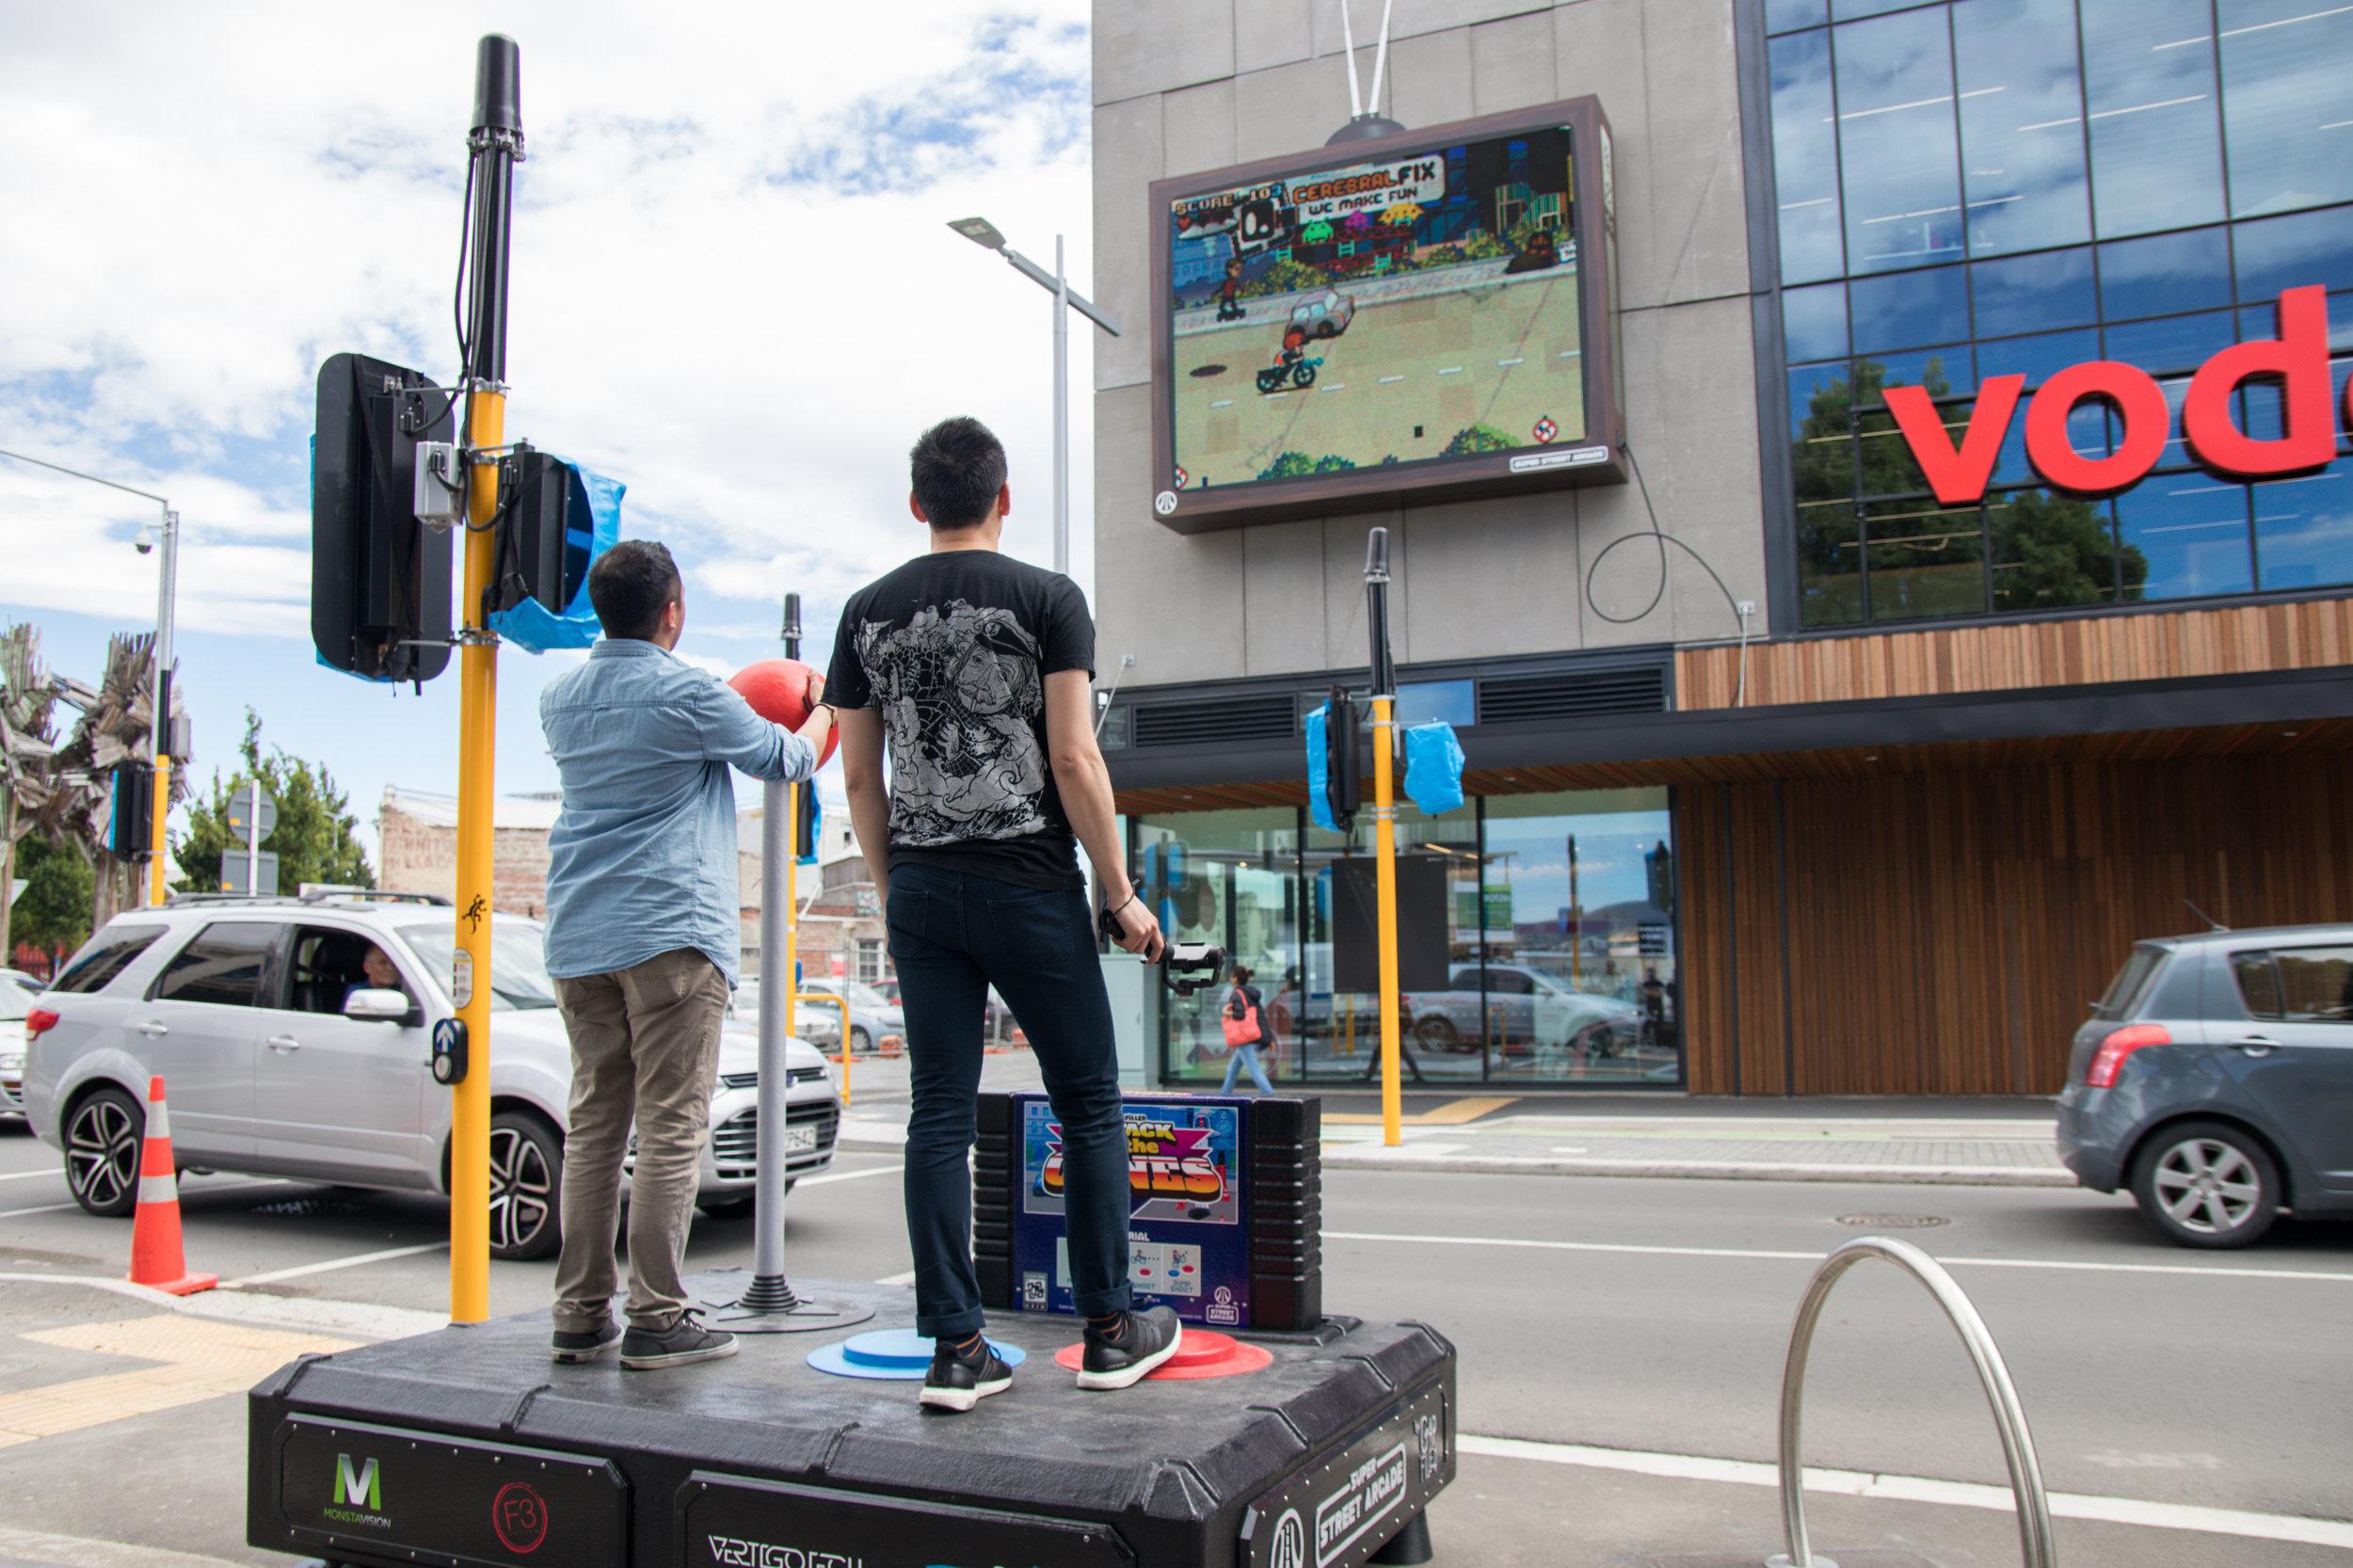 Gap Filler, Super Street Arcade (credit: Erica Austin 2015)